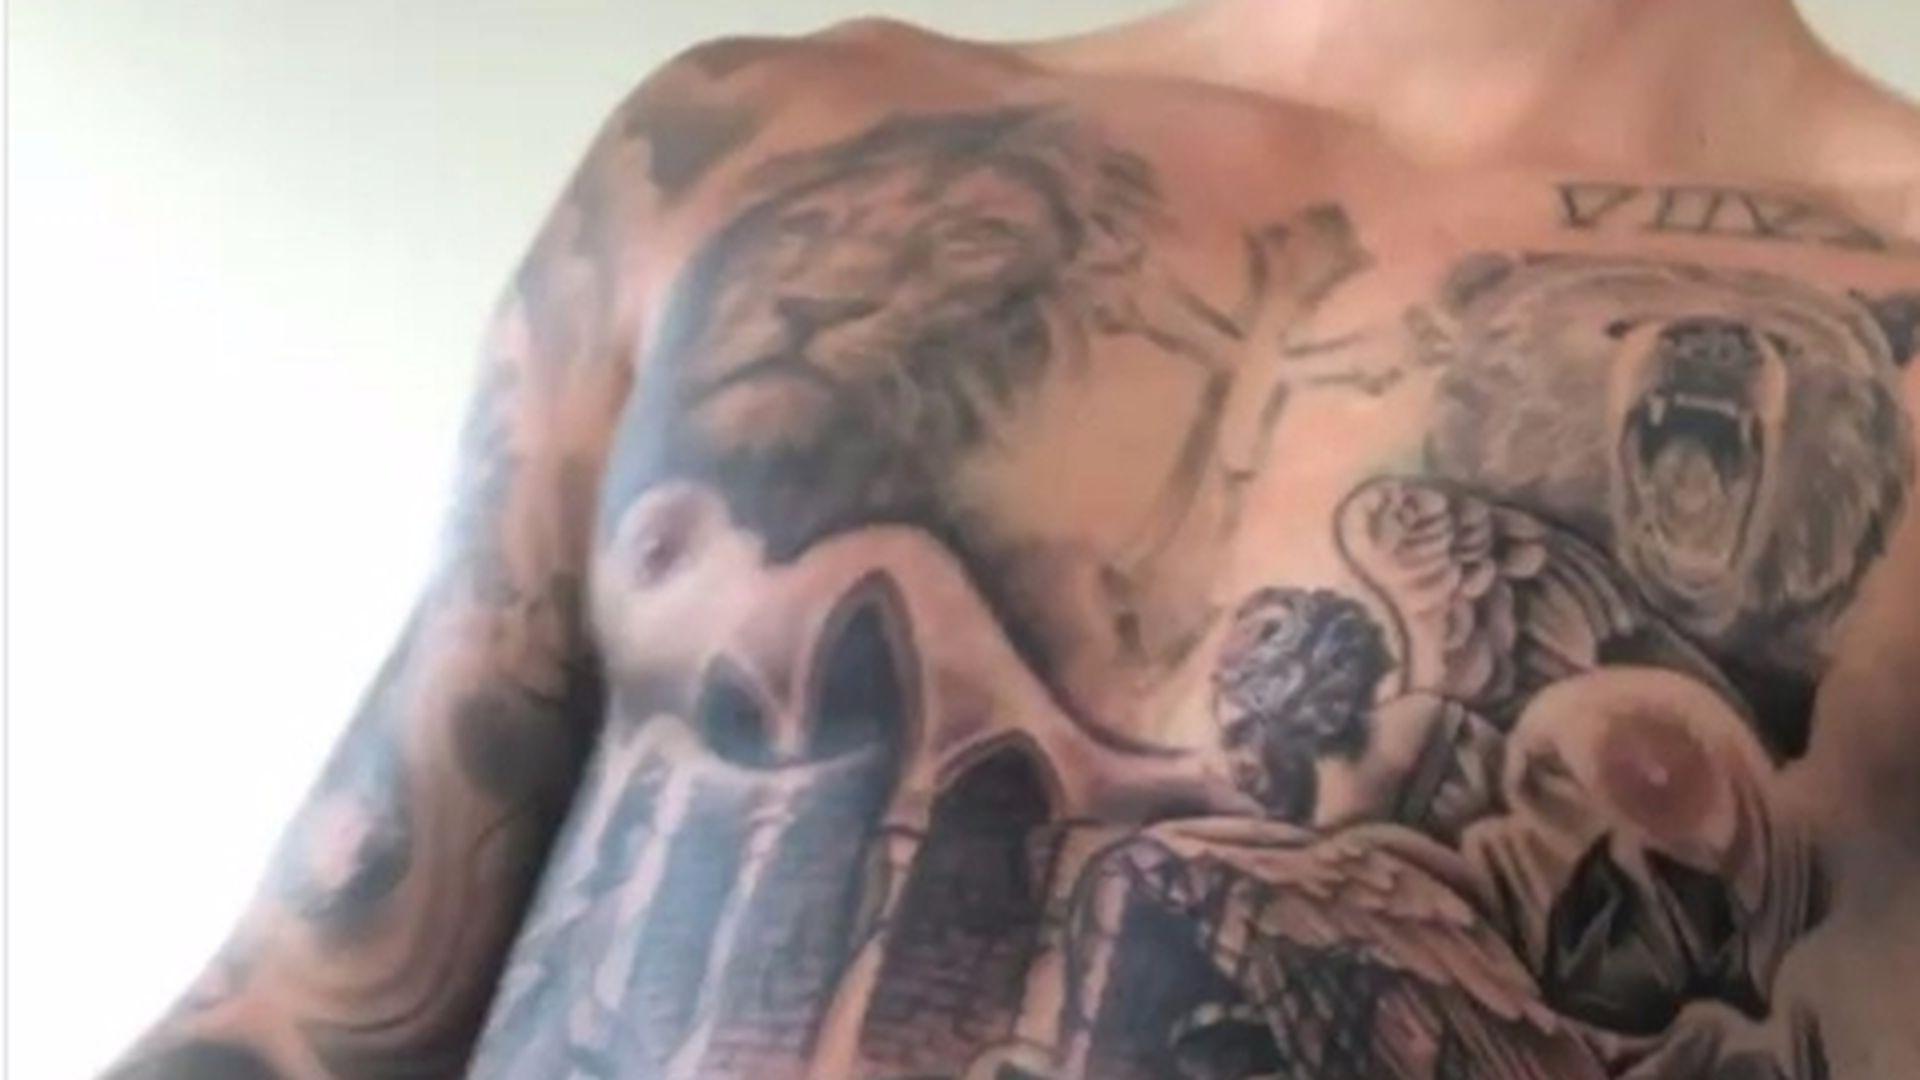 Justin Beiber Tattoos - Justin Bieber U0027s Tattoo Singer